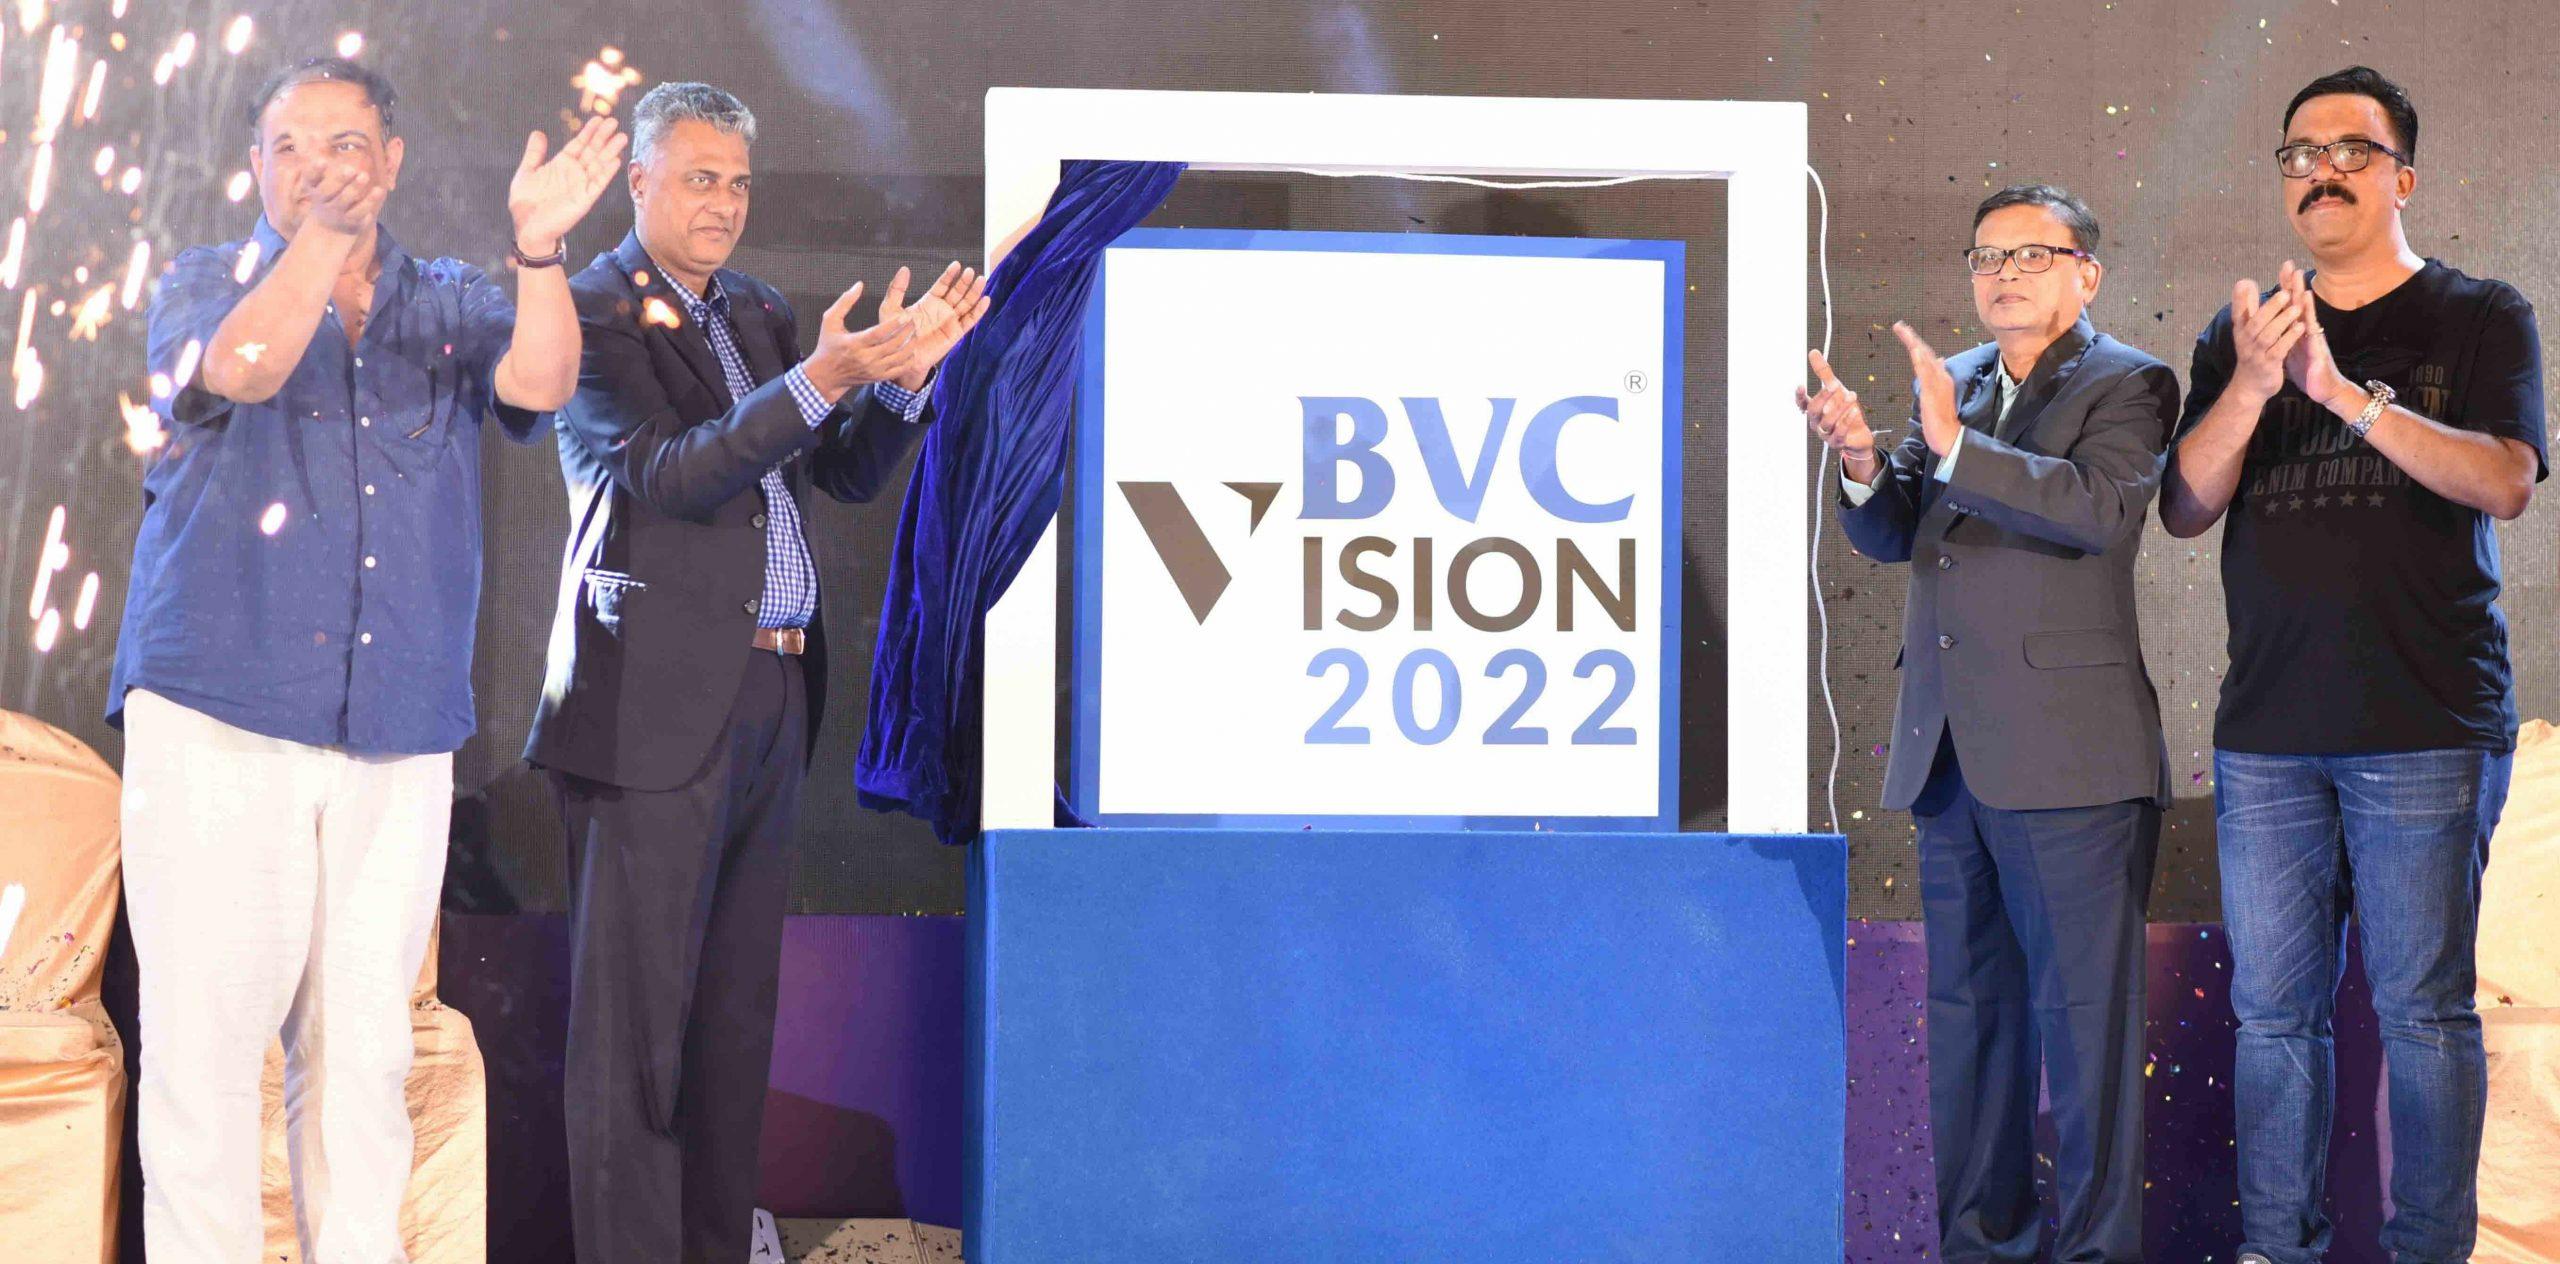 Mr Rajesh Neelakanta, CEO, BVC Logistics, Mr Uday Chinai, Chairman, BVC Logistics, Mr Bharat Badani, President, BVC Clearance & Mr Yogesh Bansode, President, BVC Brinks unveiling the Vision 2022.